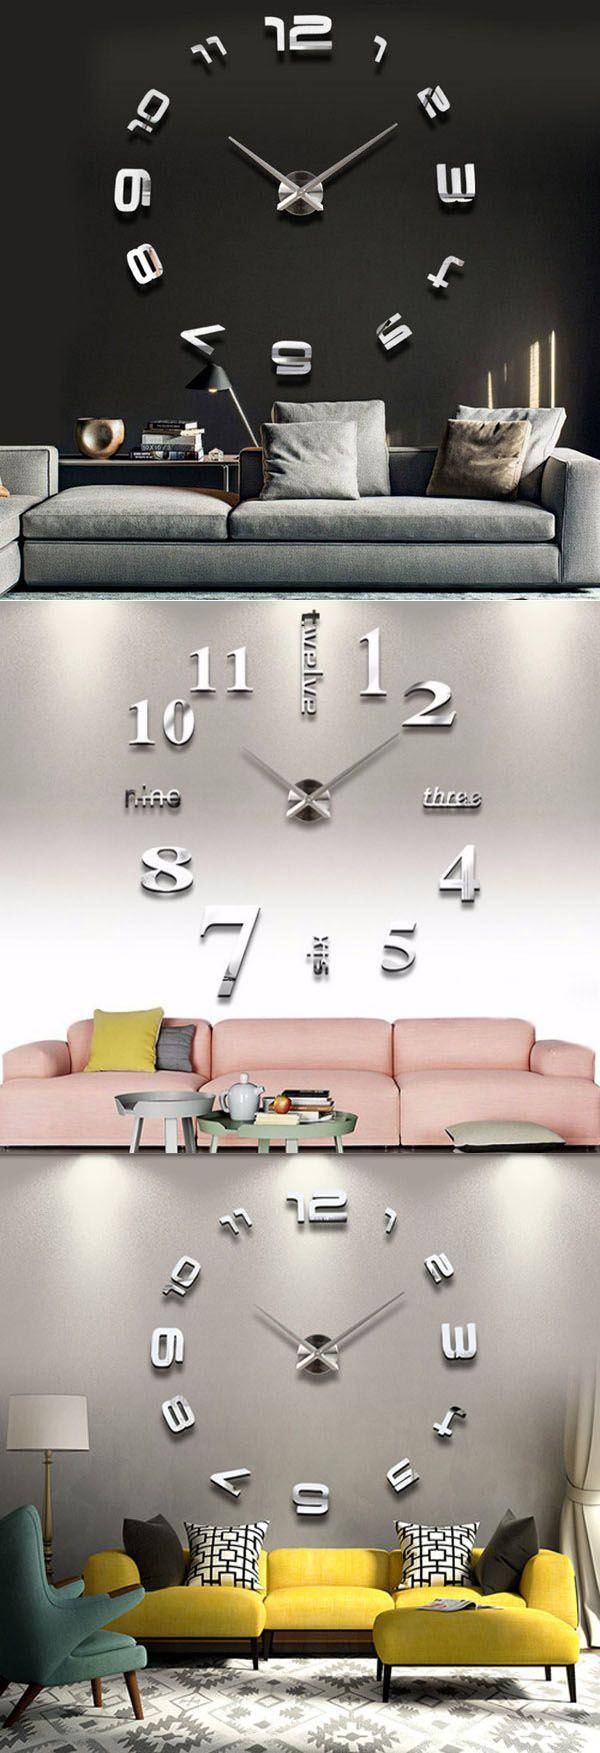 US$28.83+Free shipping. 3D Large DIY Wall Clock, Antique Wall Clocks, Decorative Wall Clocks, Modern Wall Clocks, Waterproof EVA, Silent Sweeping Movement.